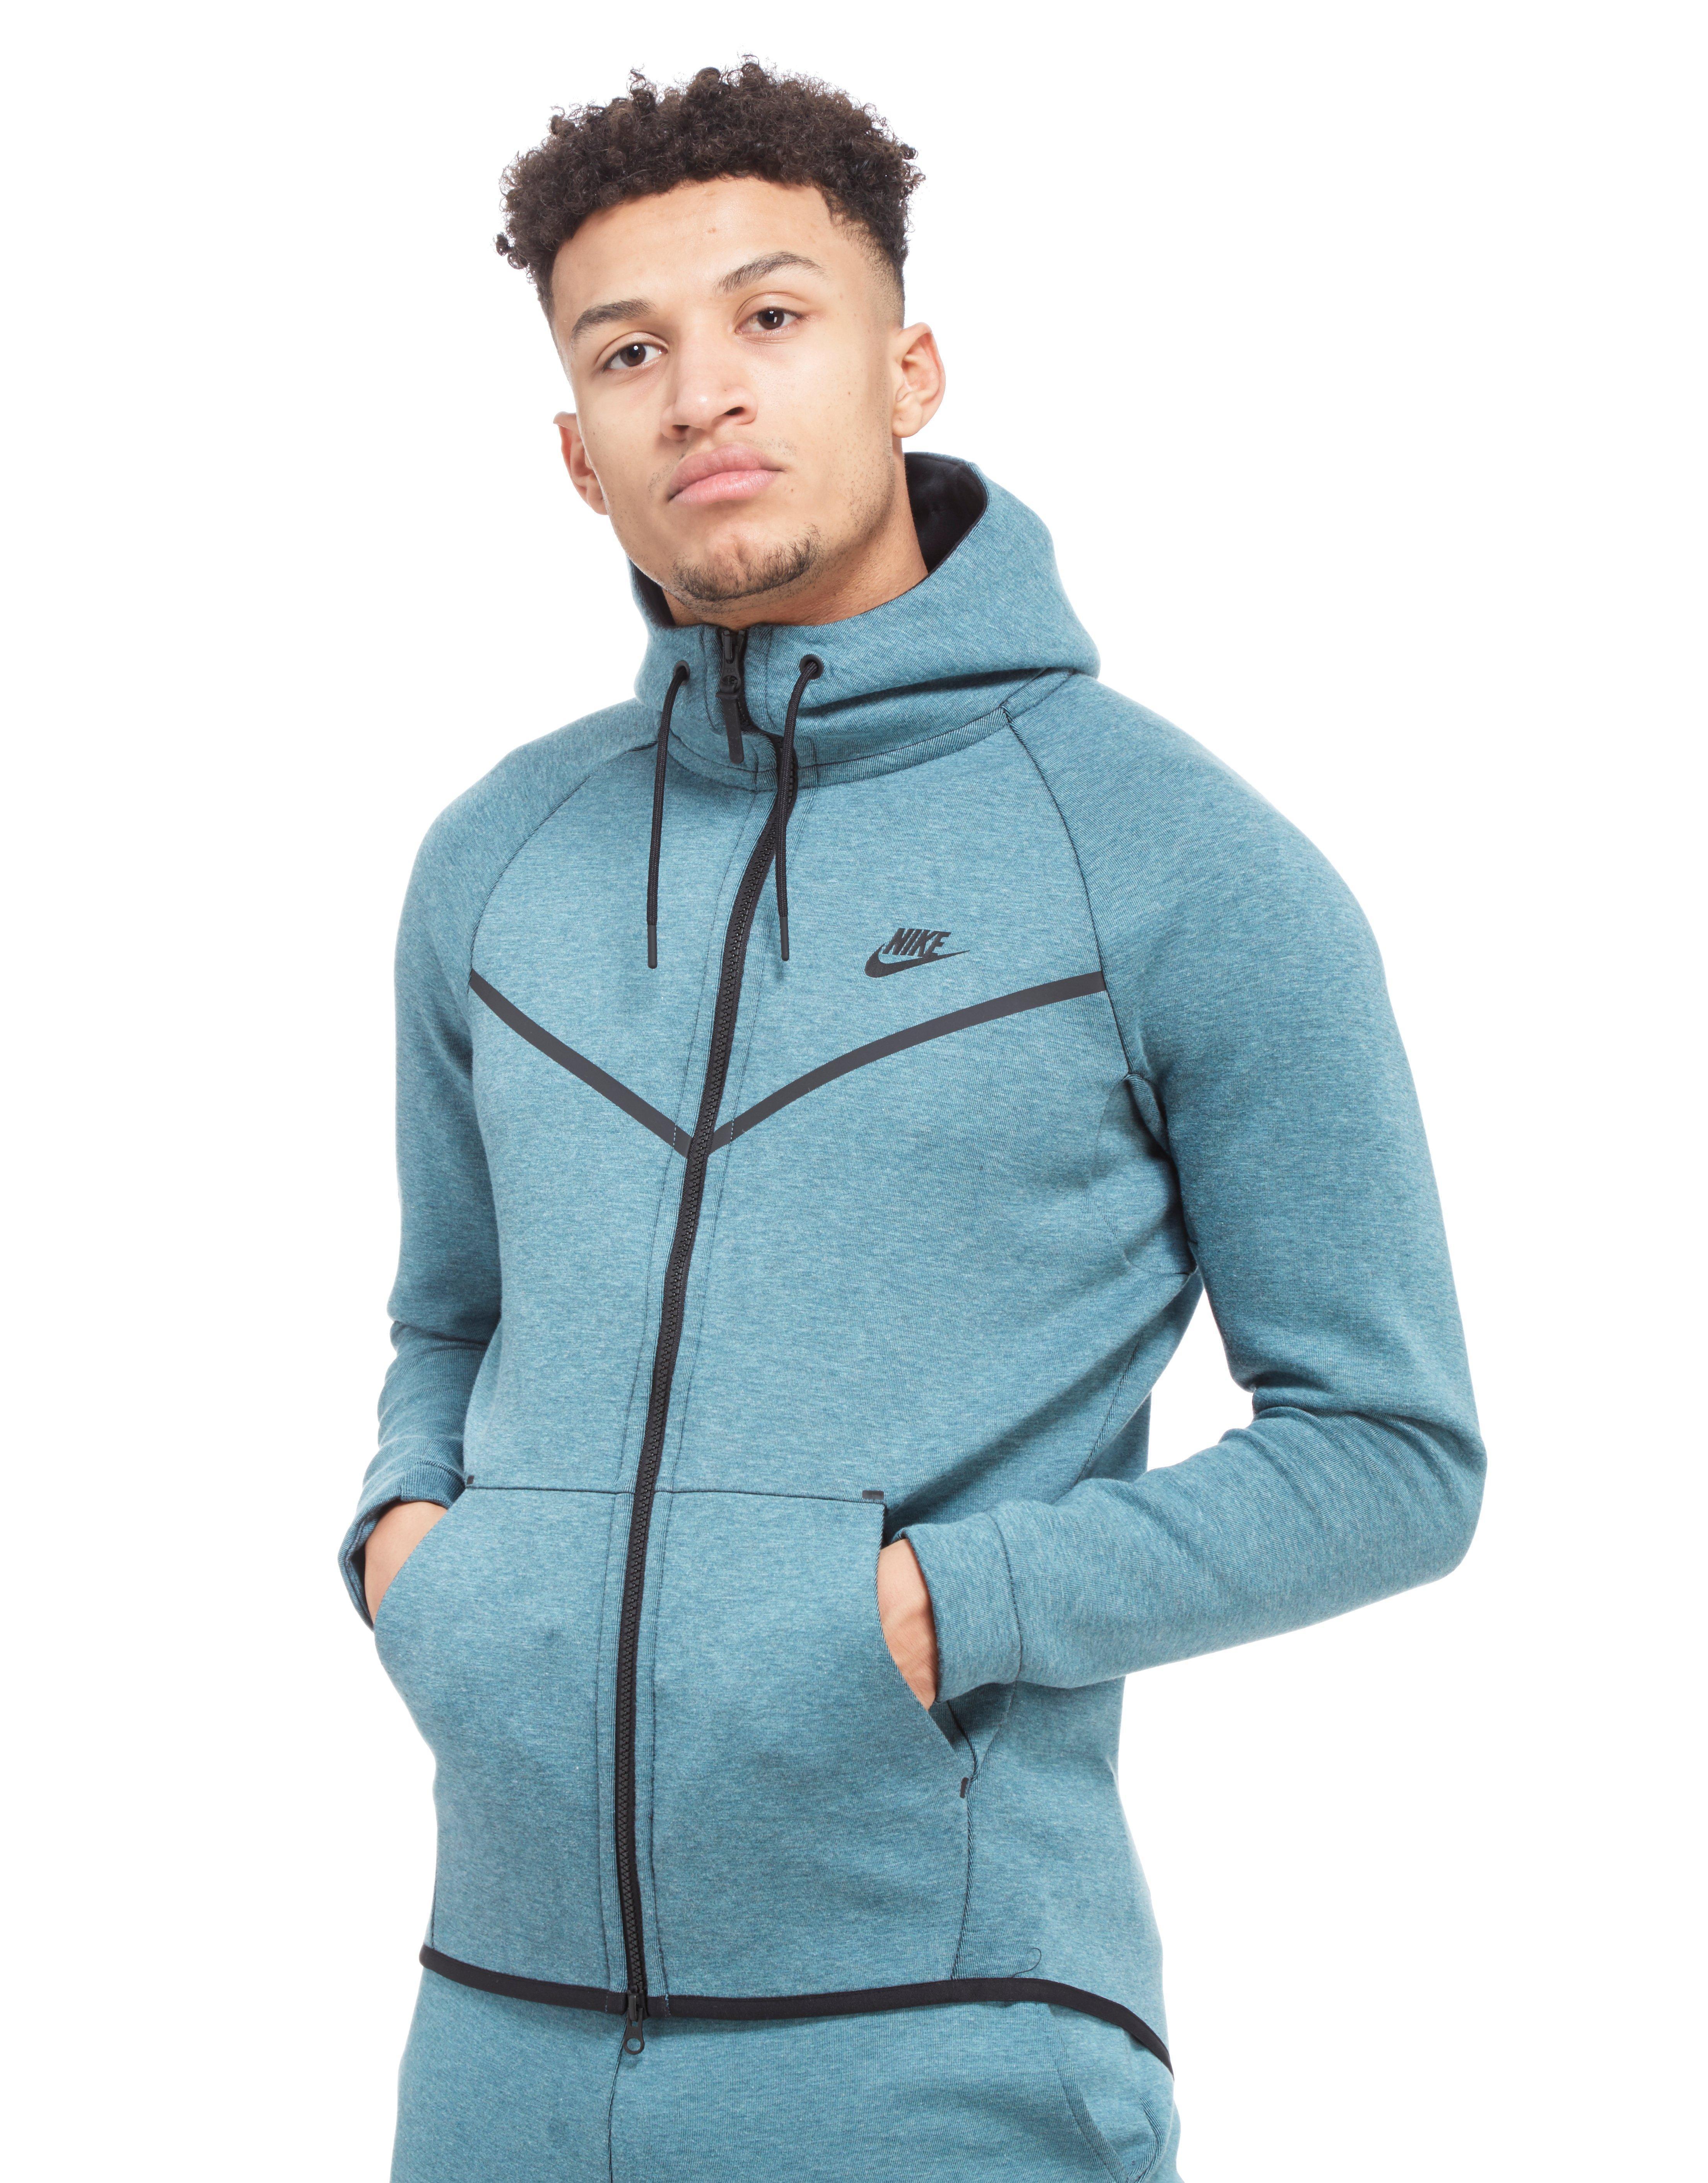 e124bd25cf Lyst - Nike Tech Fleece Windrunner Hoody in Blue for Men